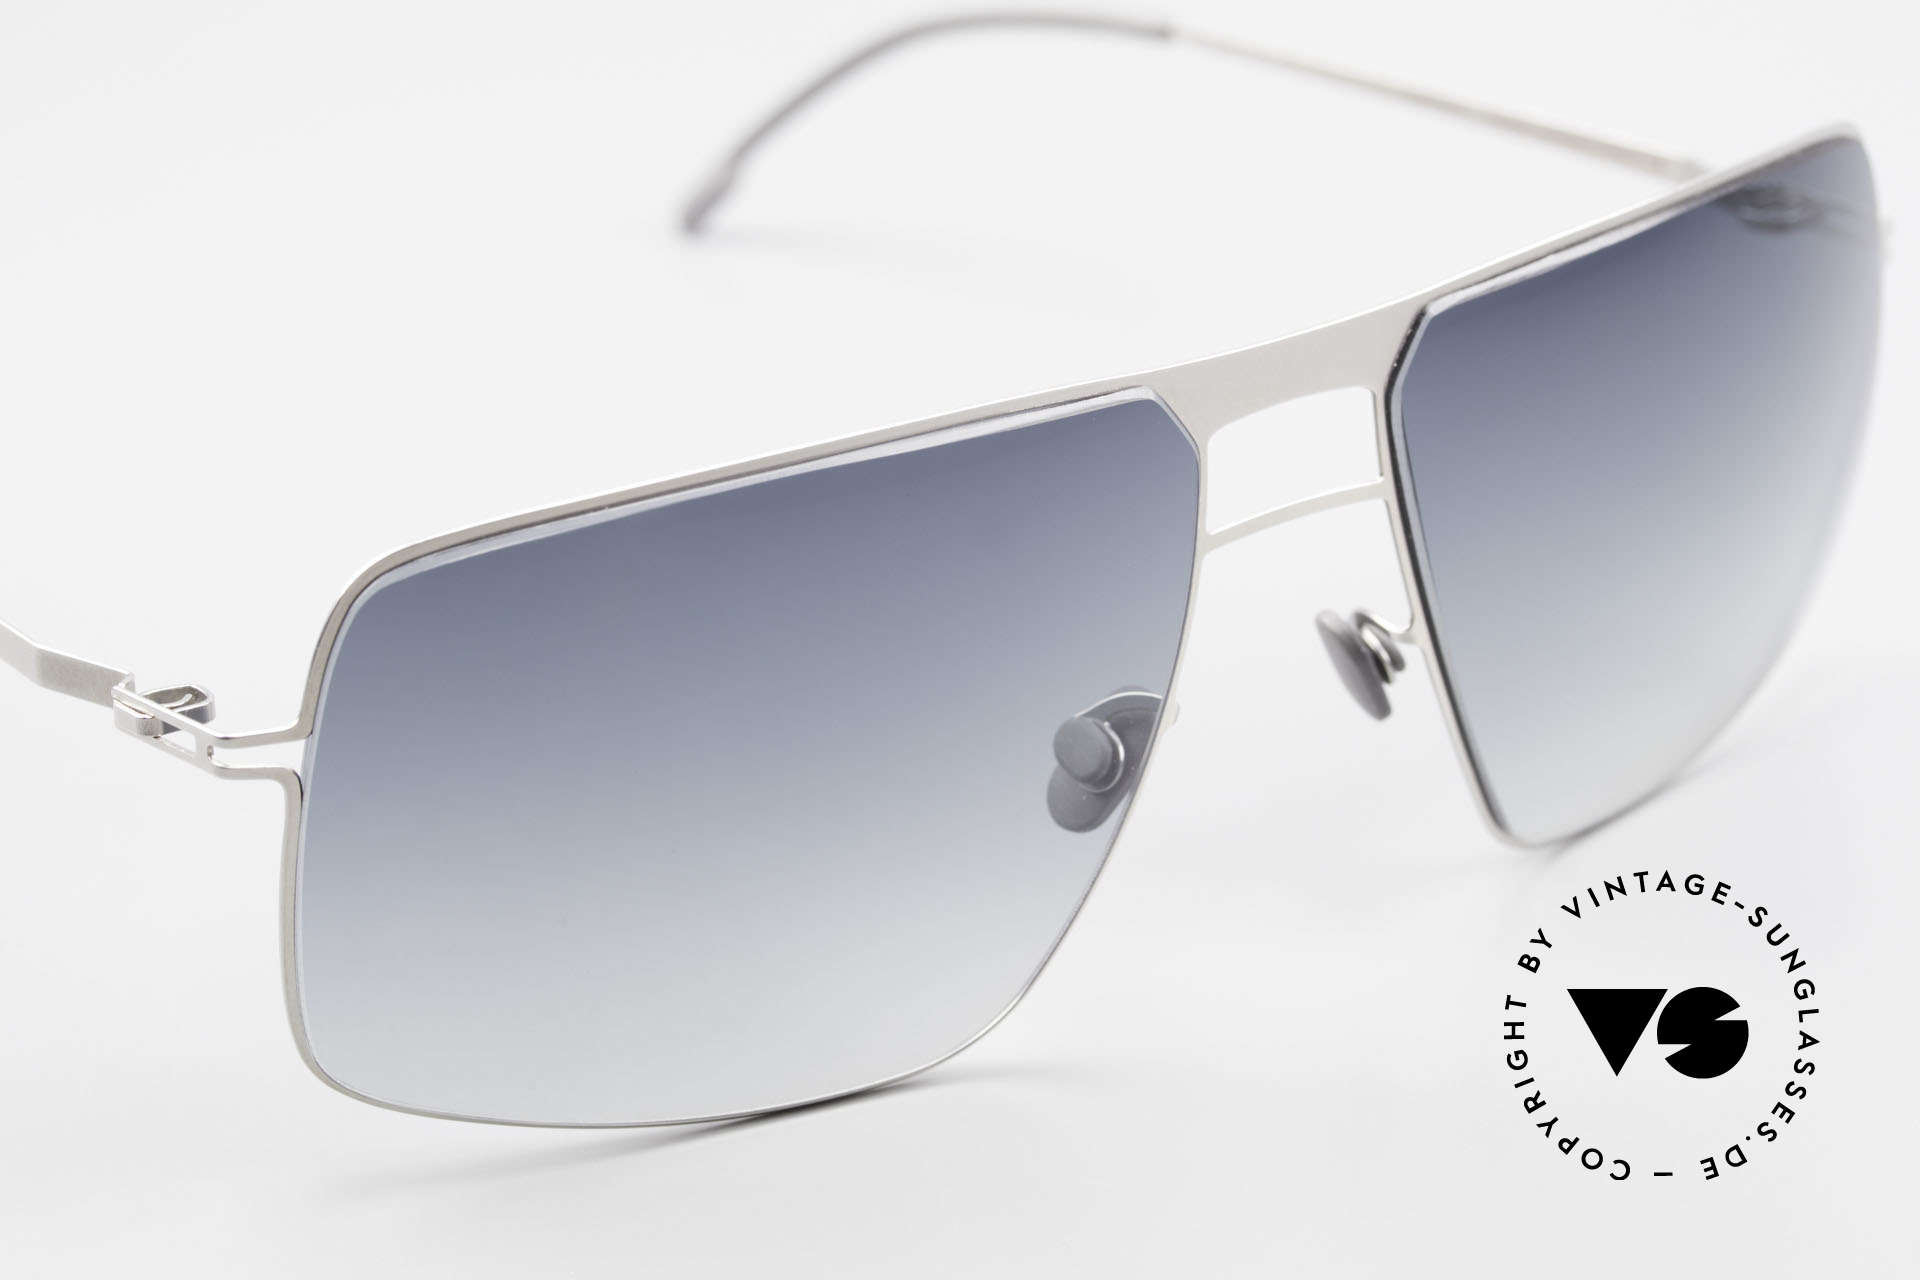 Mykita Leif Designer Men's Sunglasses 2011, top-notch quality, made in Germany (Berlin-Kreuzberg), Made for Men